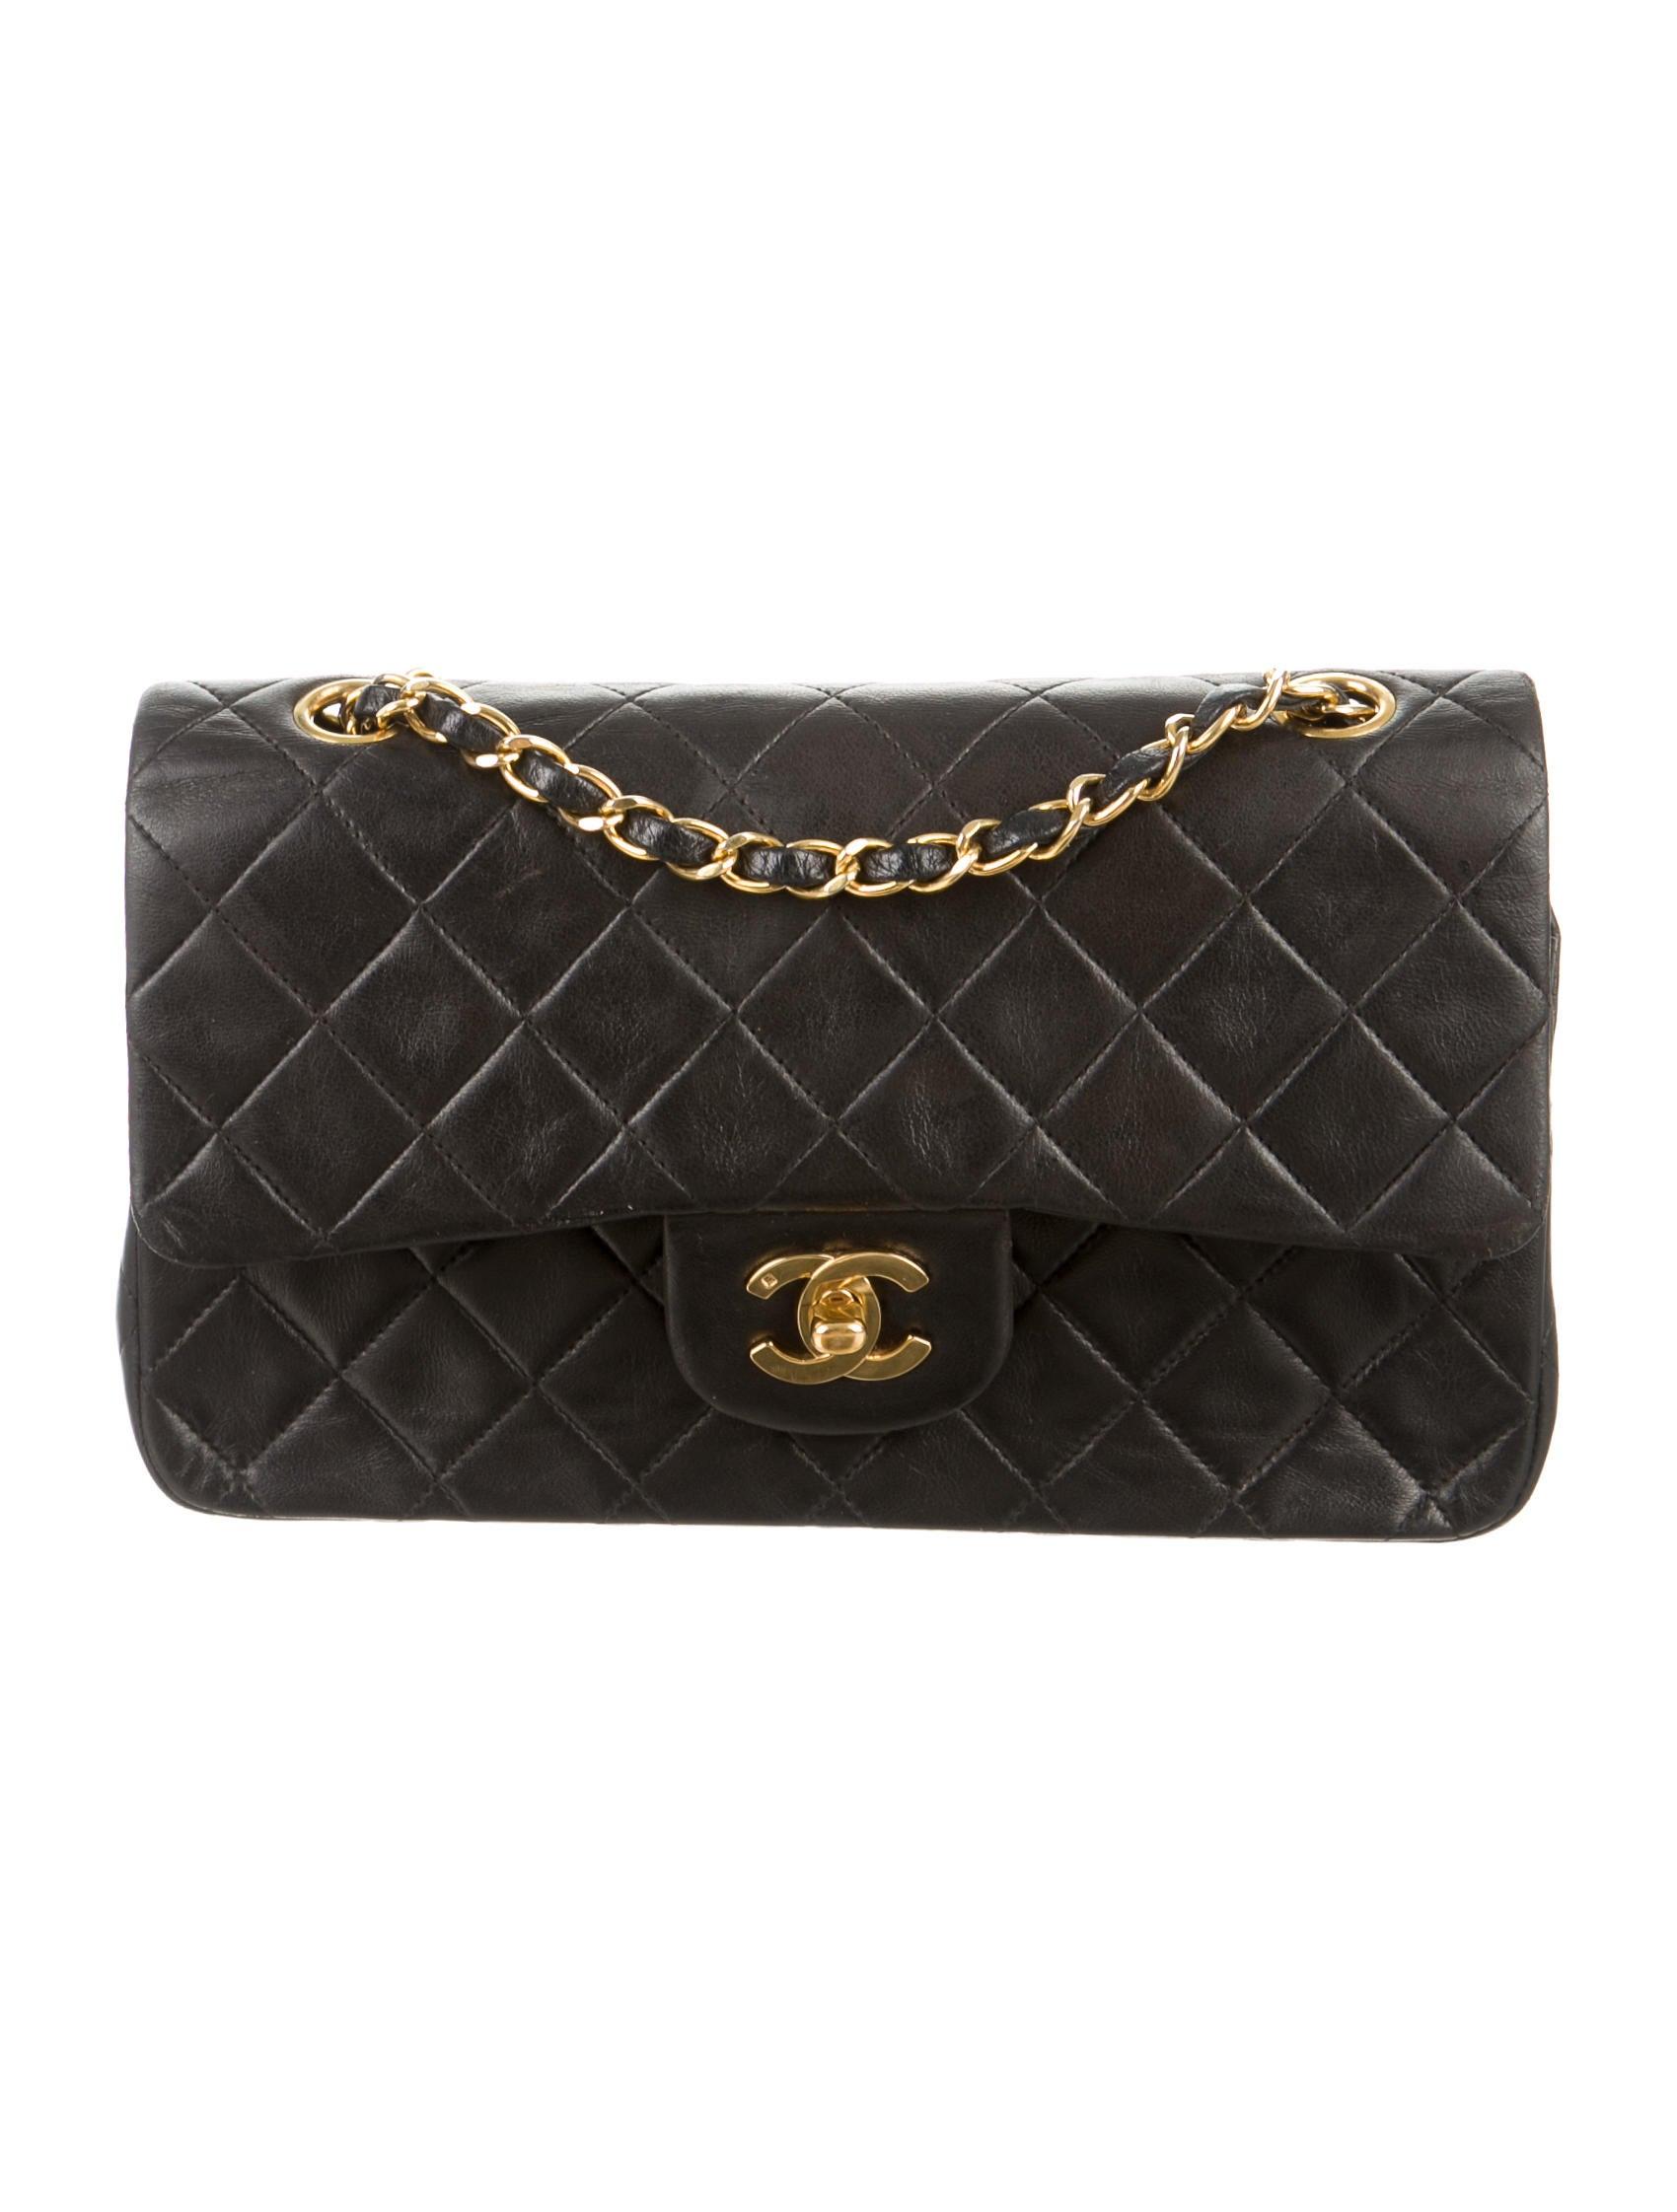 87f6f6ccb0f1 Chanel Small Classic Double Flap Bag - Handbags - CHA127786 | The RealReal